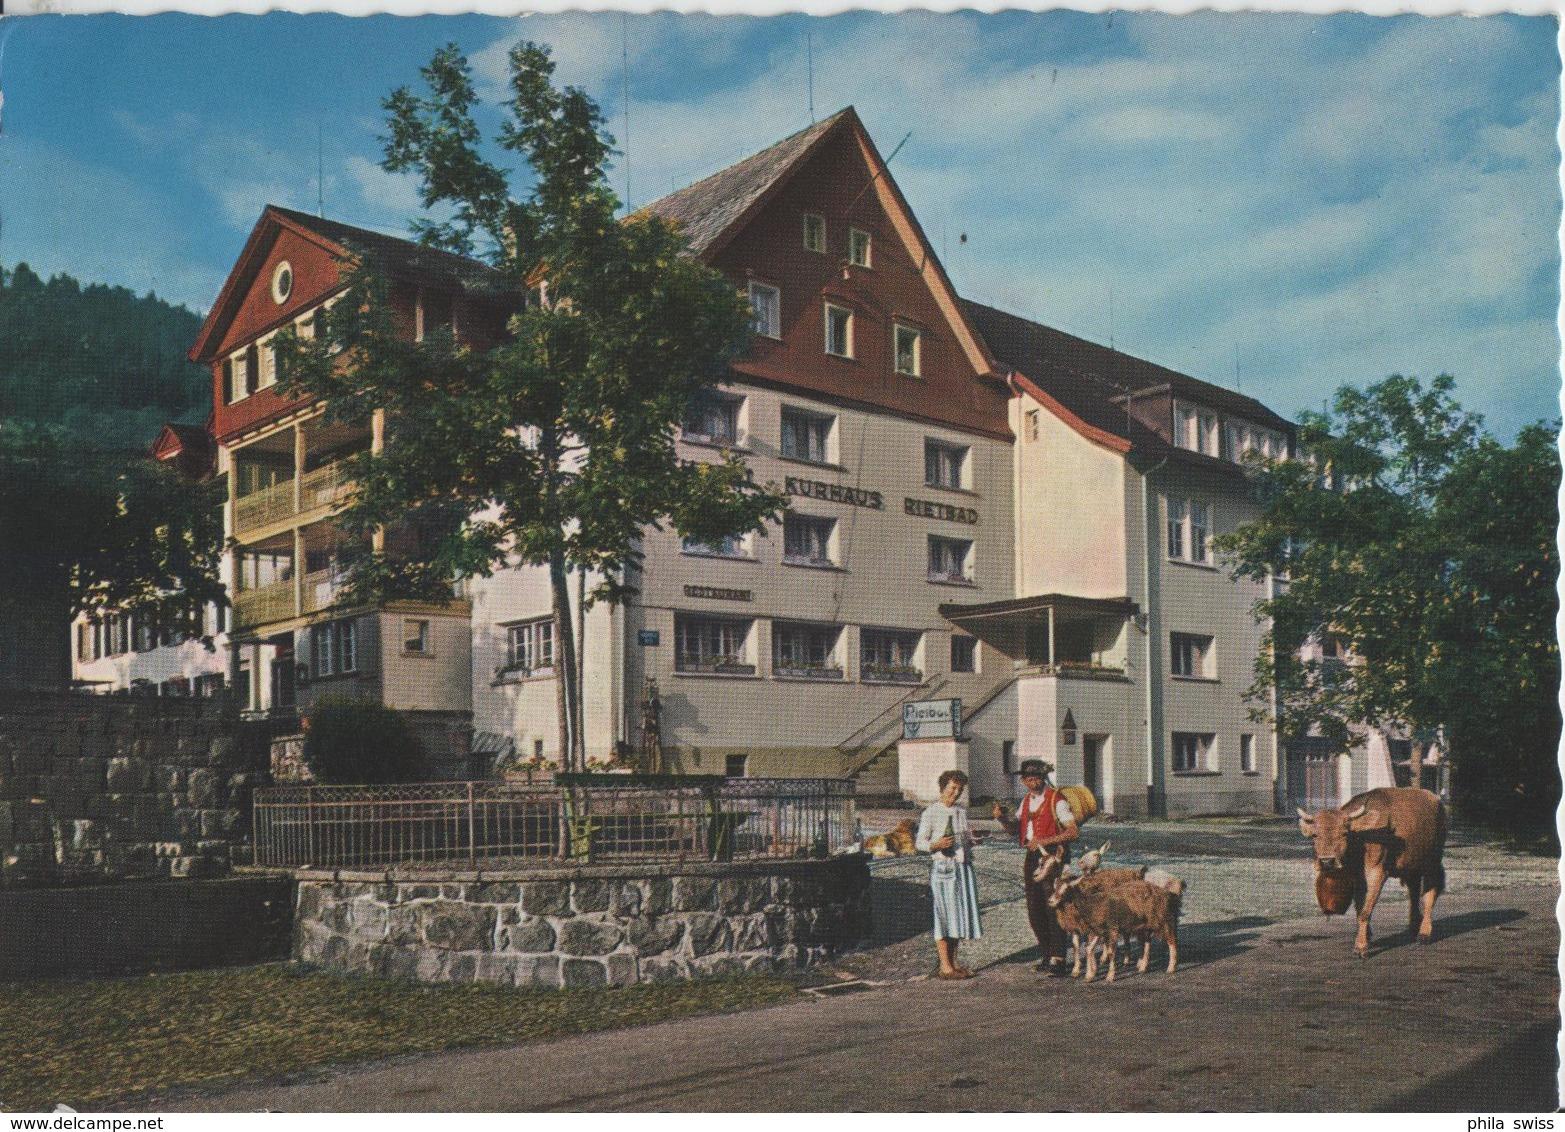 Hotel Kurhaus Rietbad (Toggenburg) Hunde, Kuh, Geisen Chevres Goat - Photo: Rud. Suter - SG St. Gall